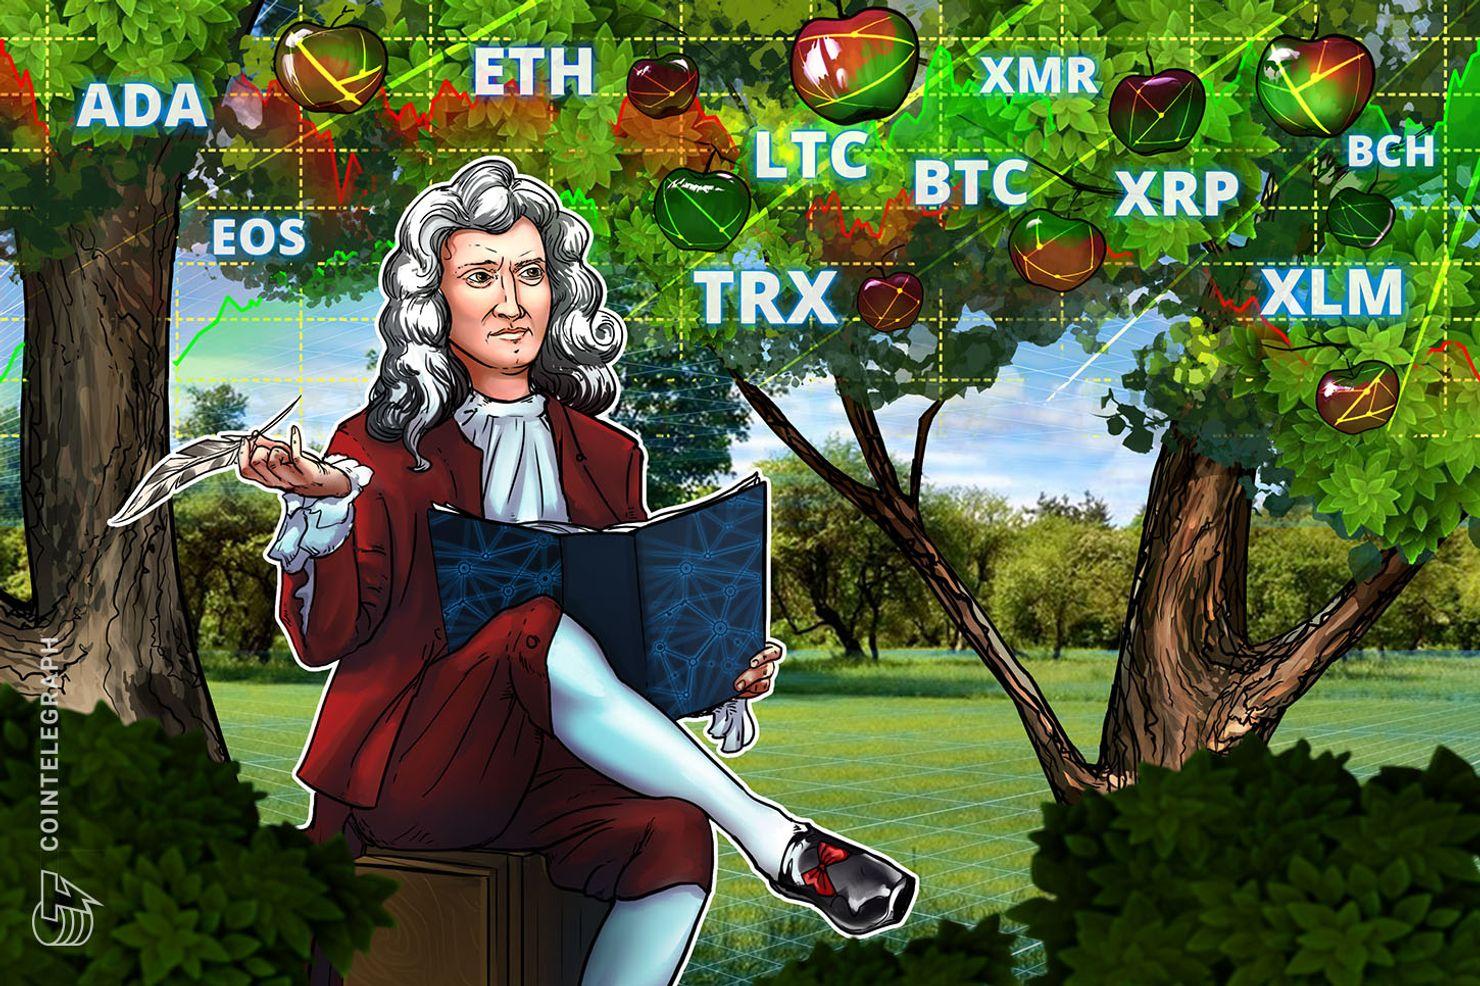 Bitcoin, Ethereum, Ripple, Bitcoin Cash, EOS, Stellar, Litecoin, Cardano, Monero, TRON: Price Analysis, October 12